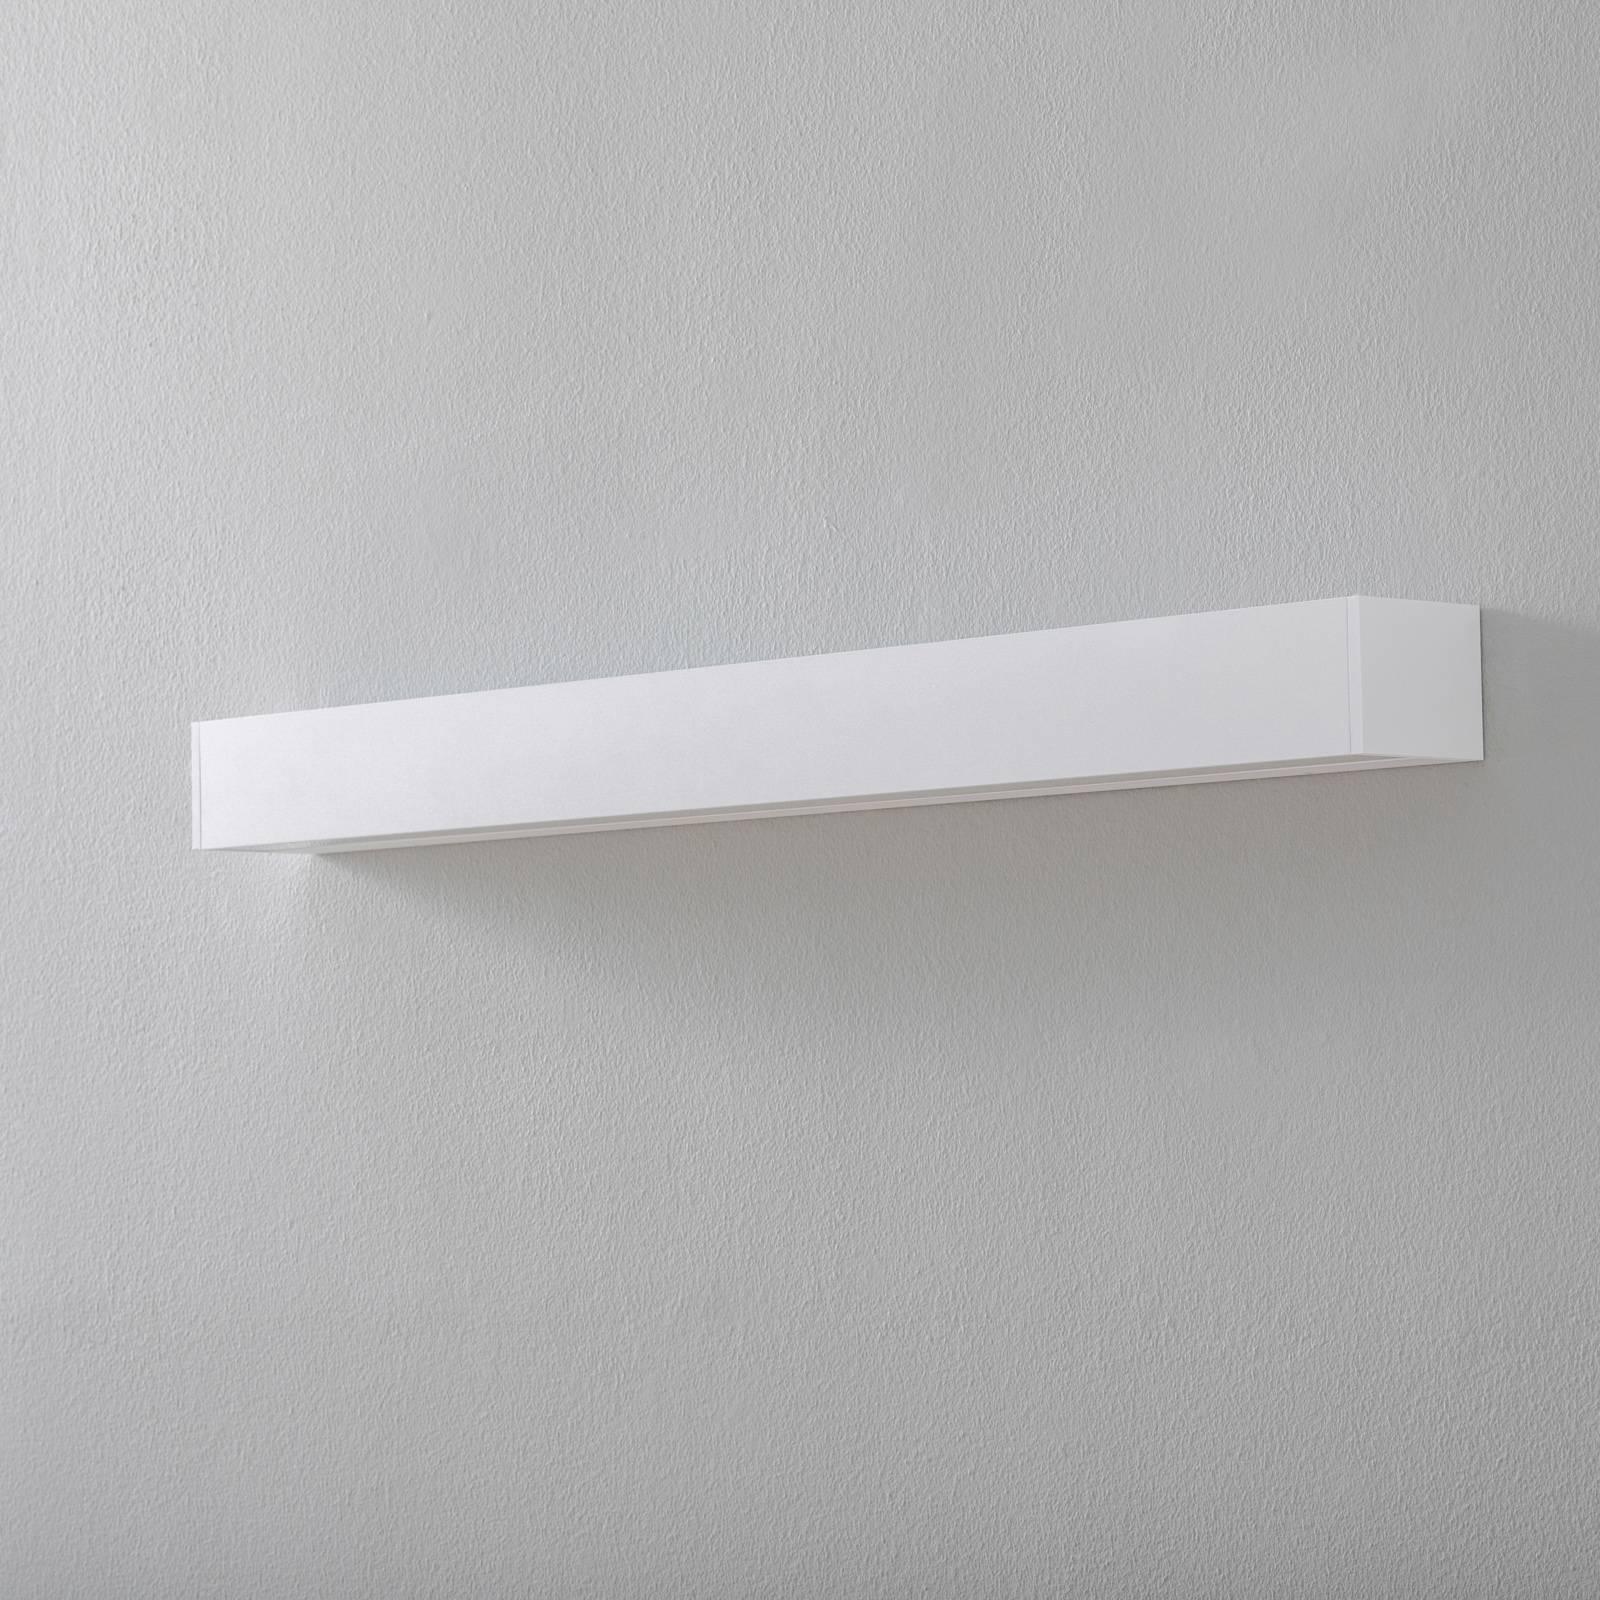 BEGA 50801 LED-seinälamppu valkoinen 92cm 5 640lm